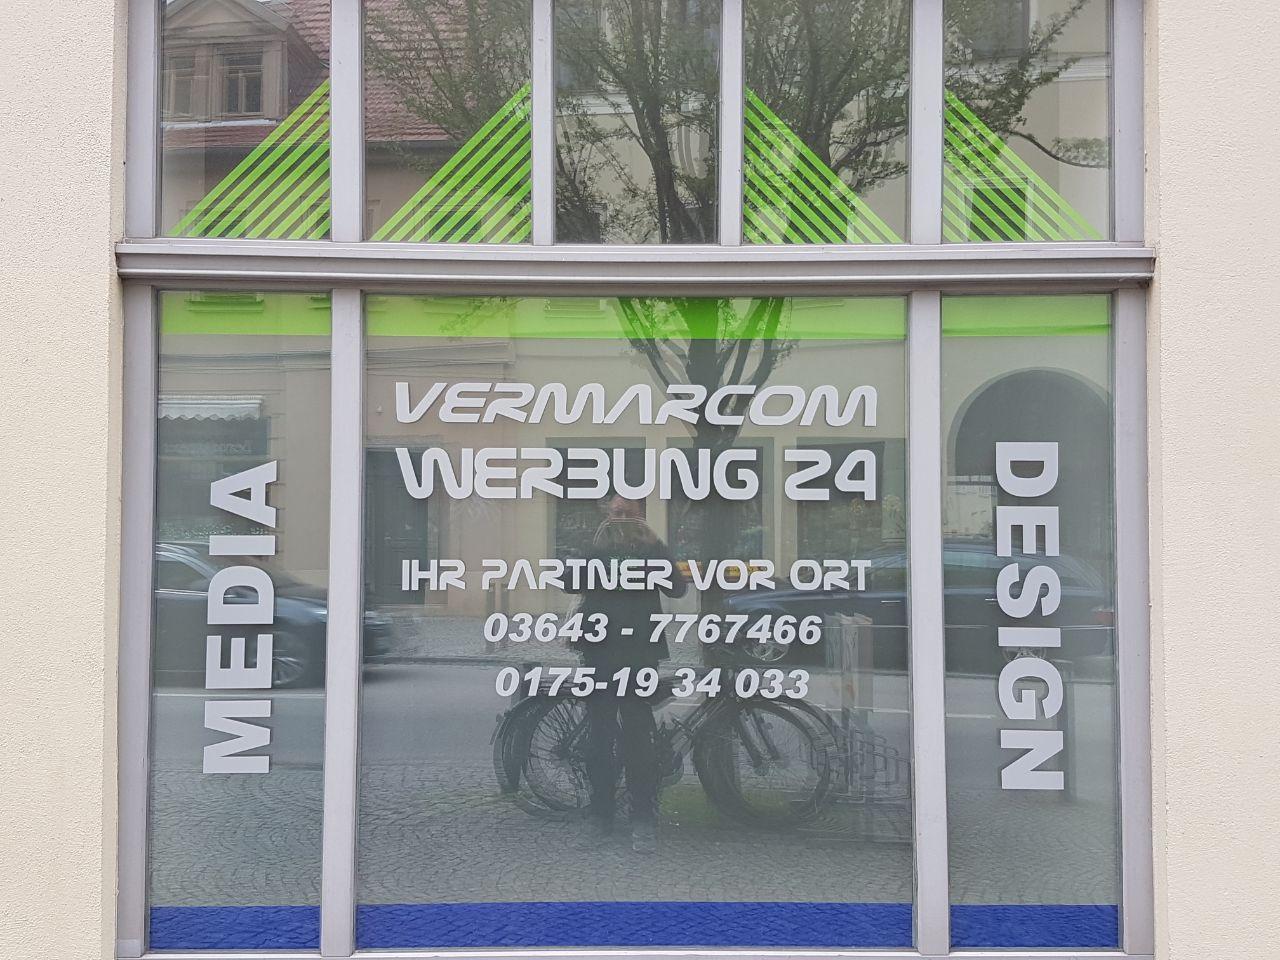 Vermarcom Werbung 24